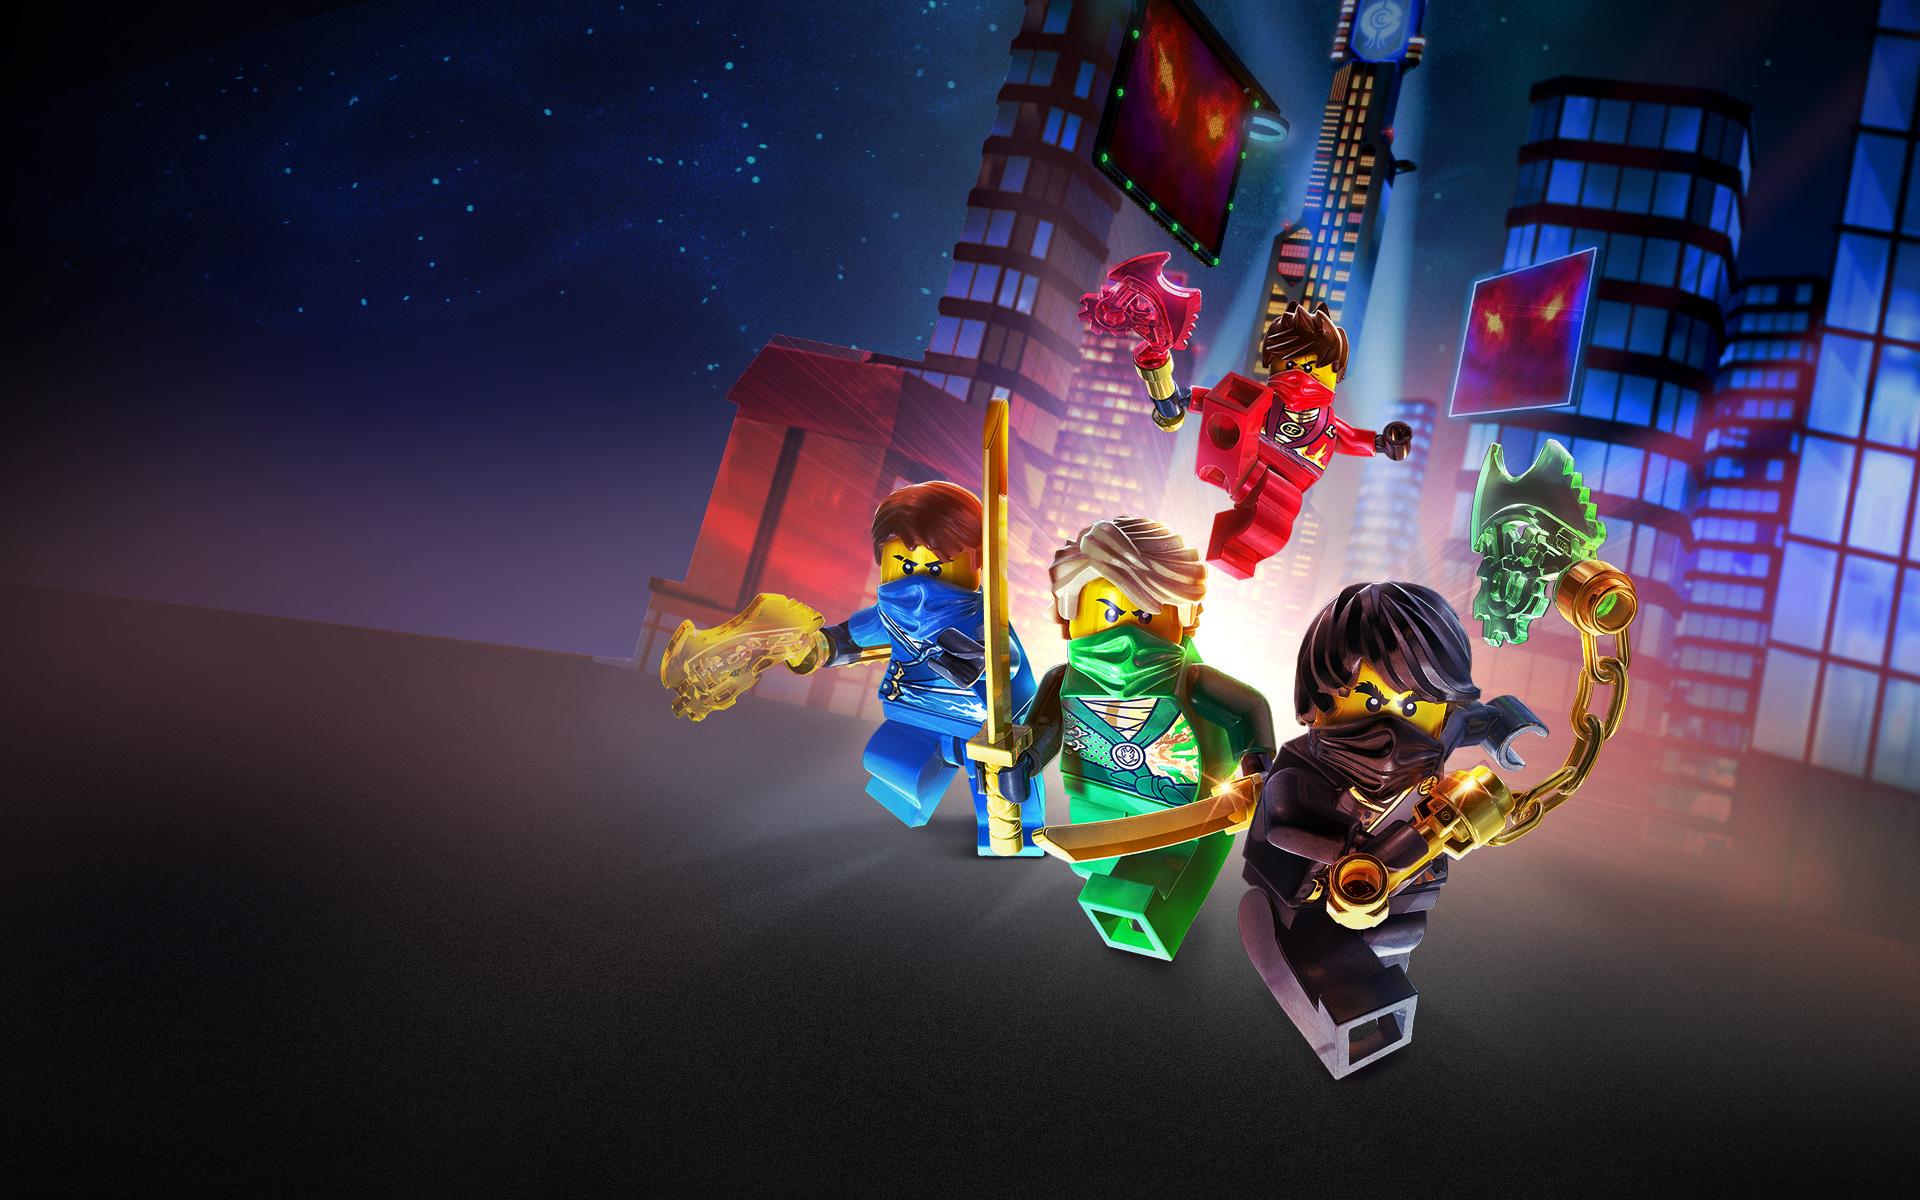 Ninjago Golden Ninja Wallpaper Lego Ninjago Background